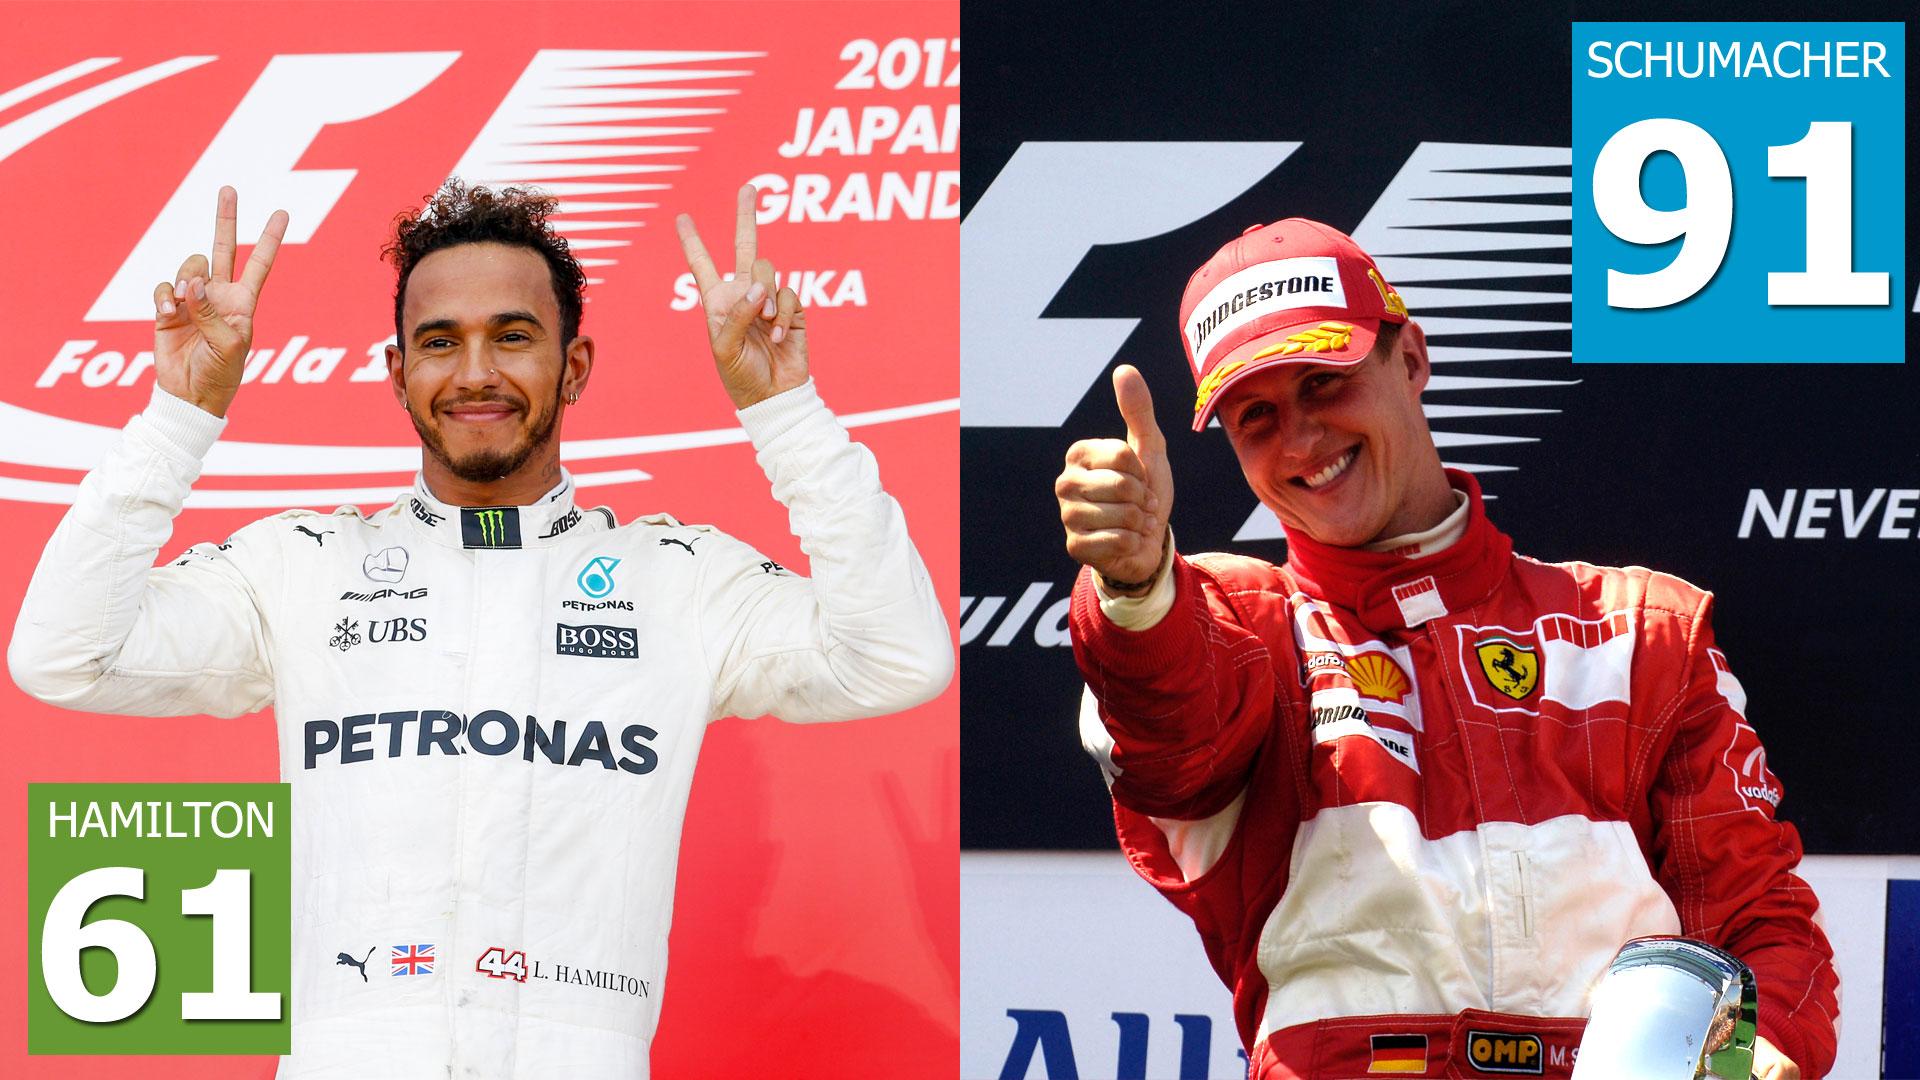 Lewis Hamilton and Michael Schumacher